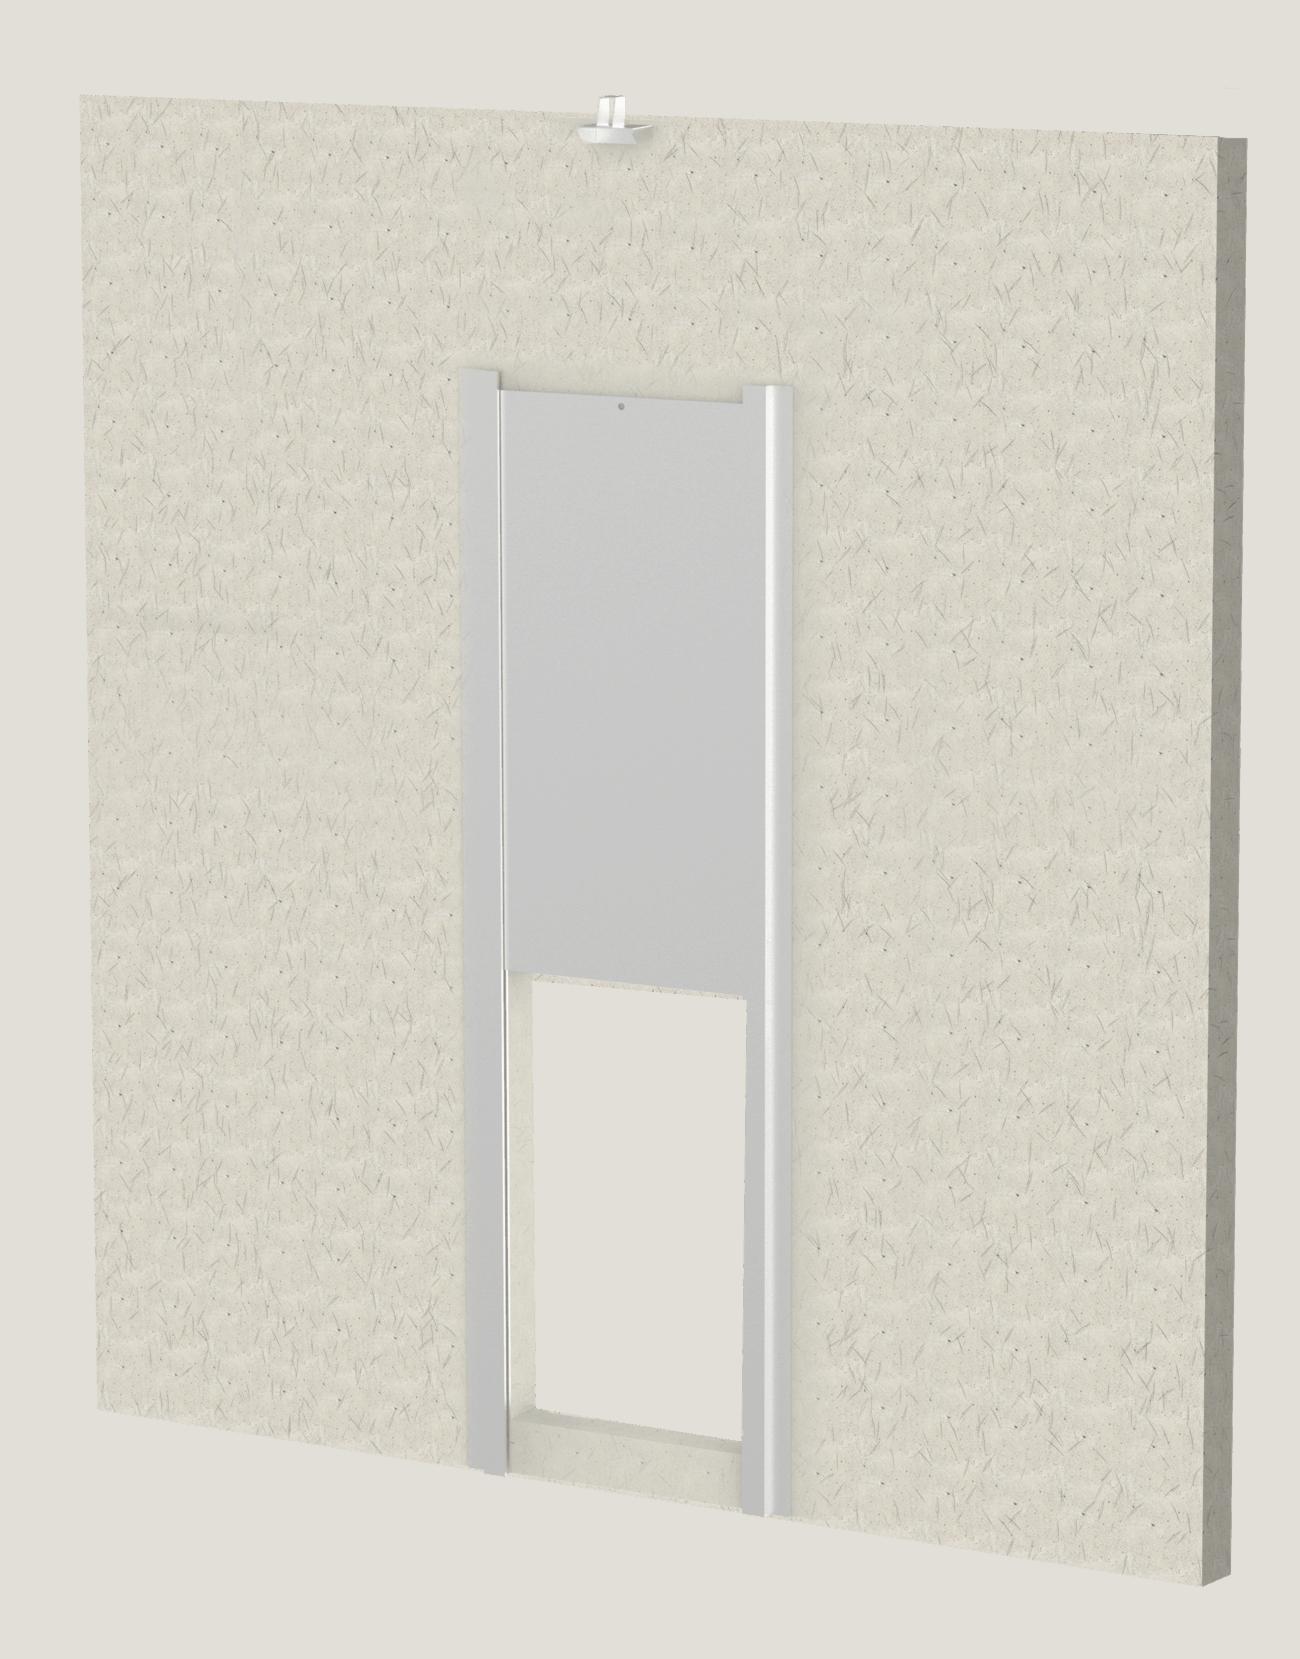 Full Height Block Wall with Transfer Door